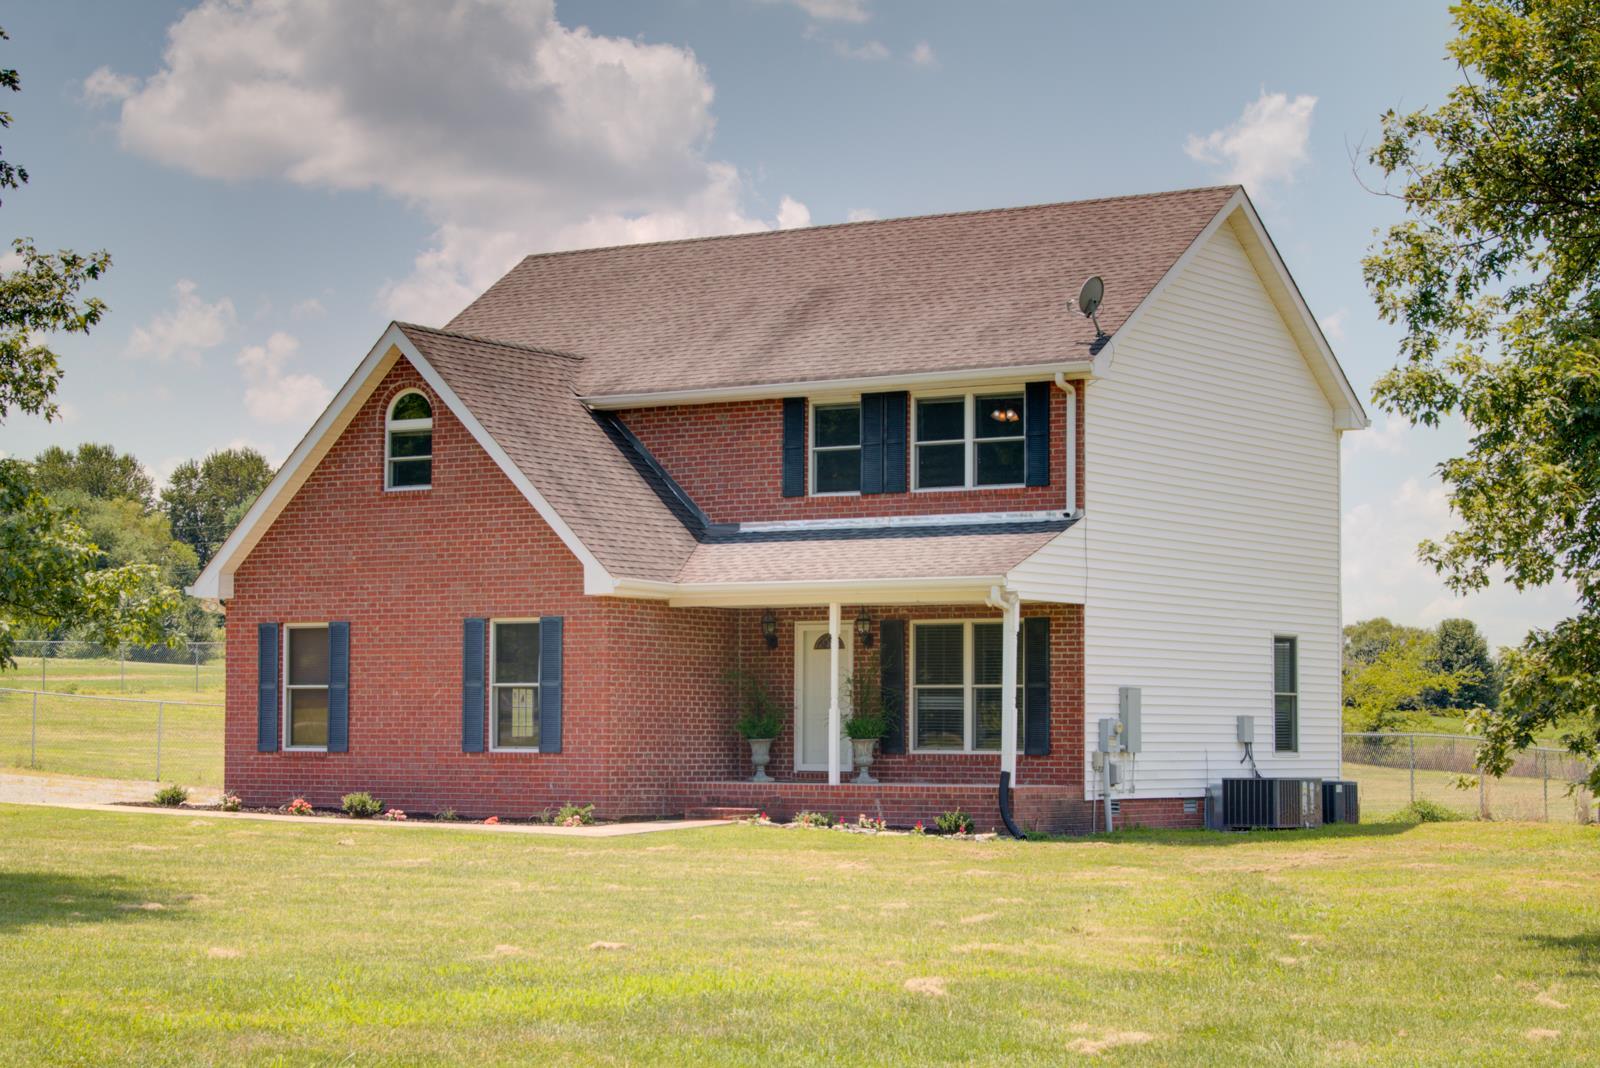 1051 Old Hopewell Rd, Castalian Springs, TN 37031 - Castalian Springs, TN real estate listing